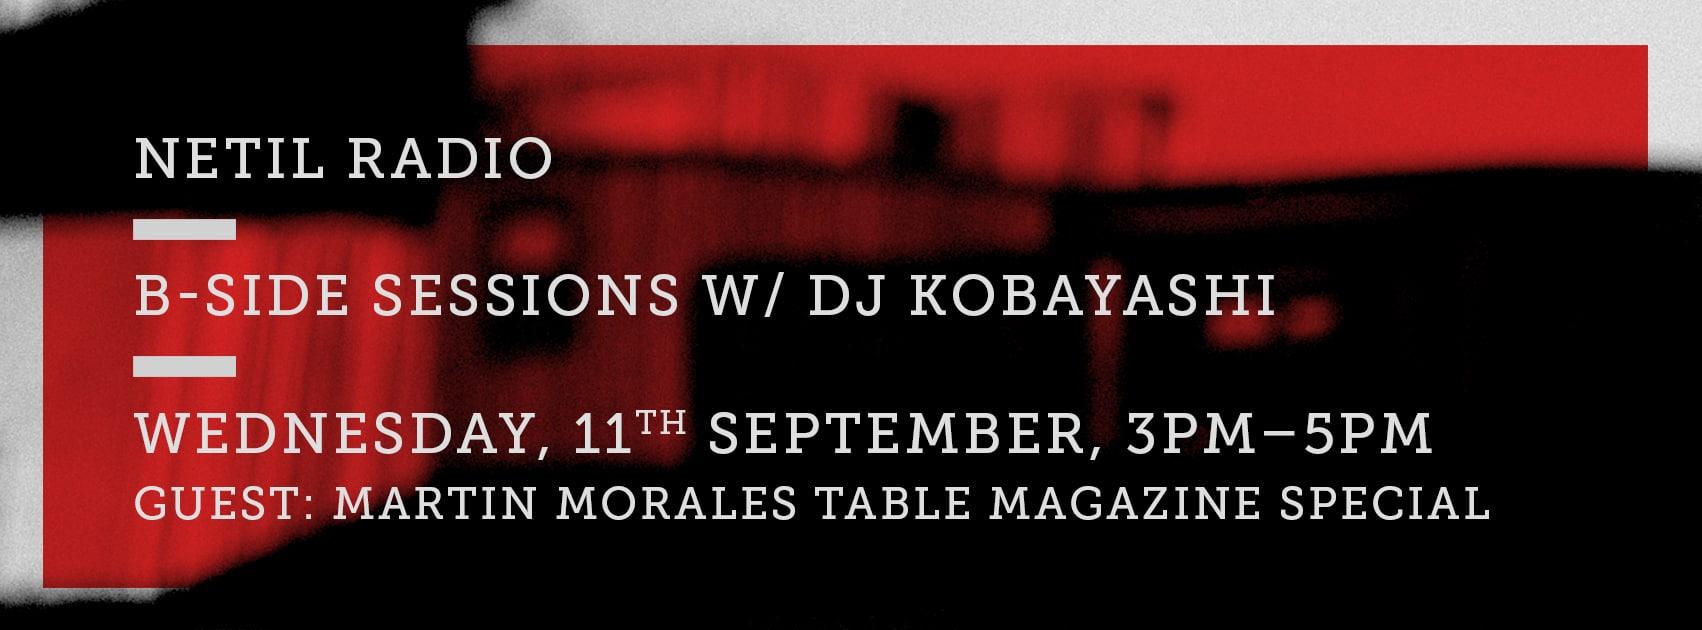 Netil Radio B-Side Sessions martin Morales